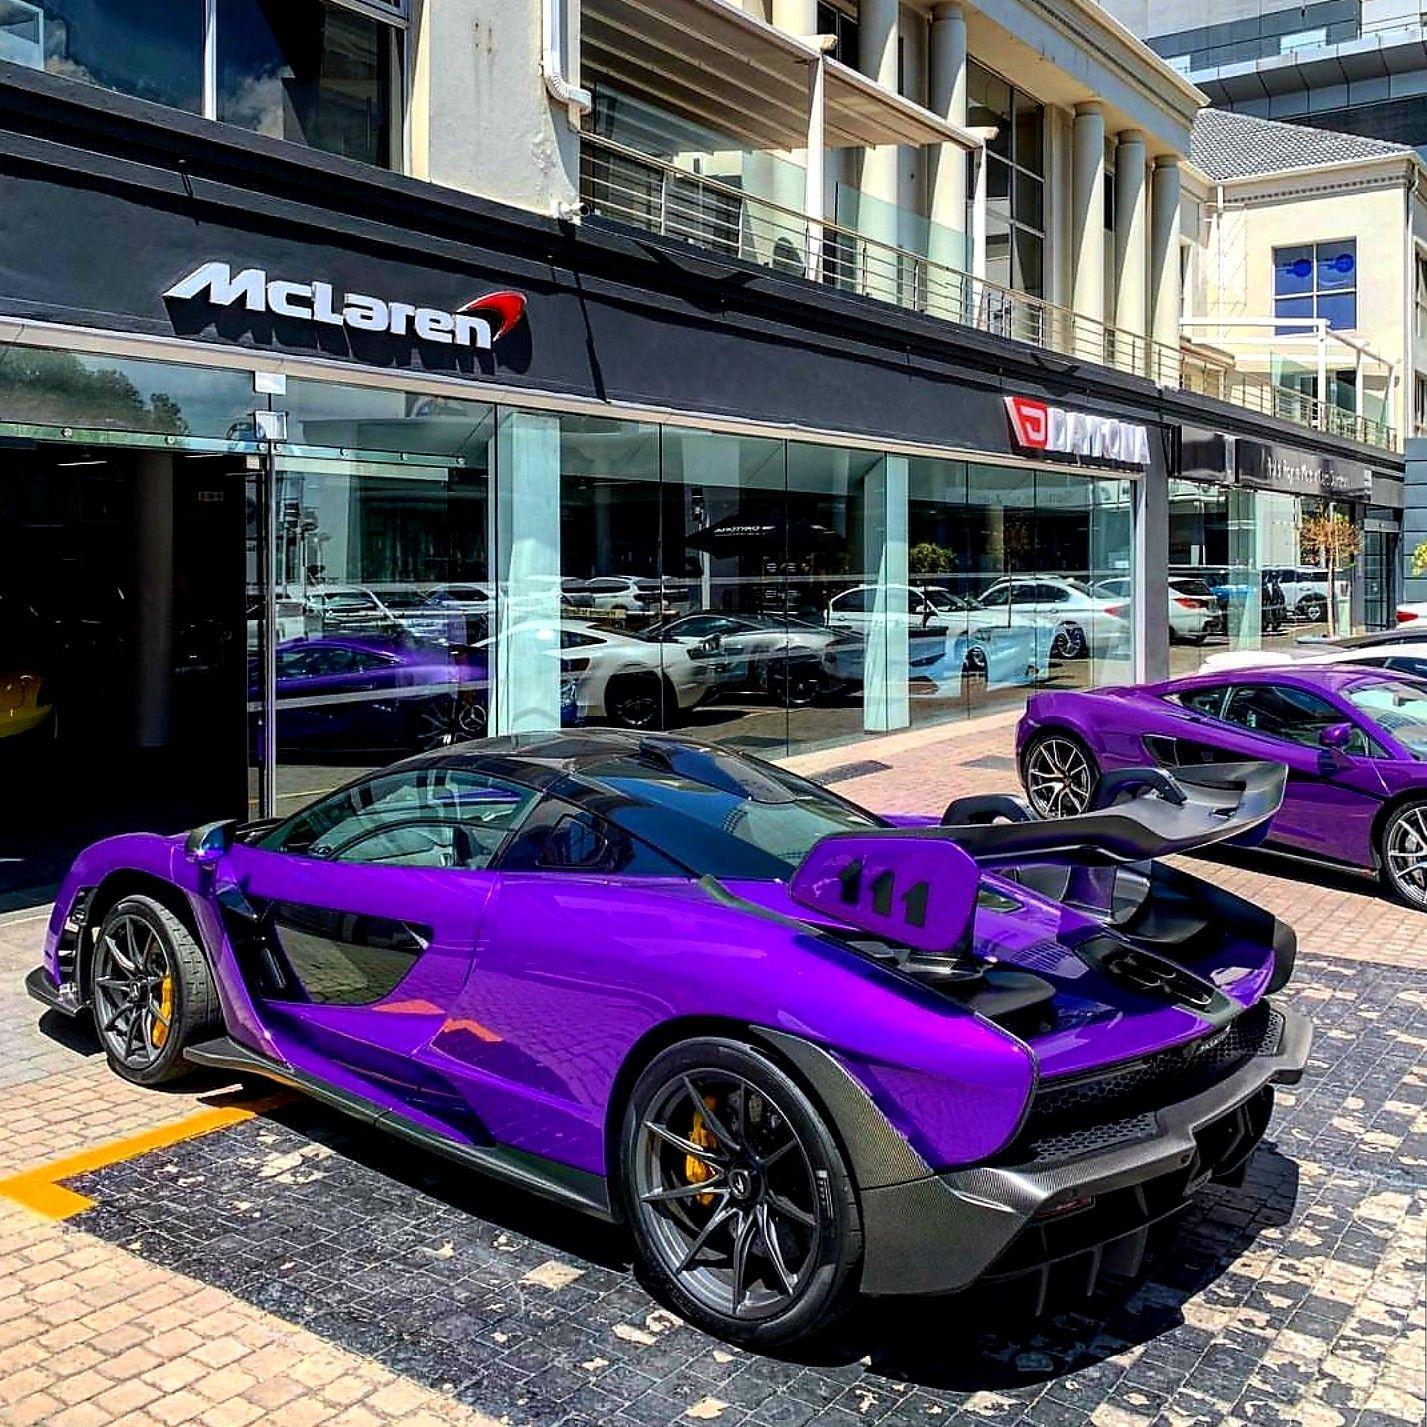 Mclaren Senna Car Neiro Insta Z Litwhips Luxury Cars